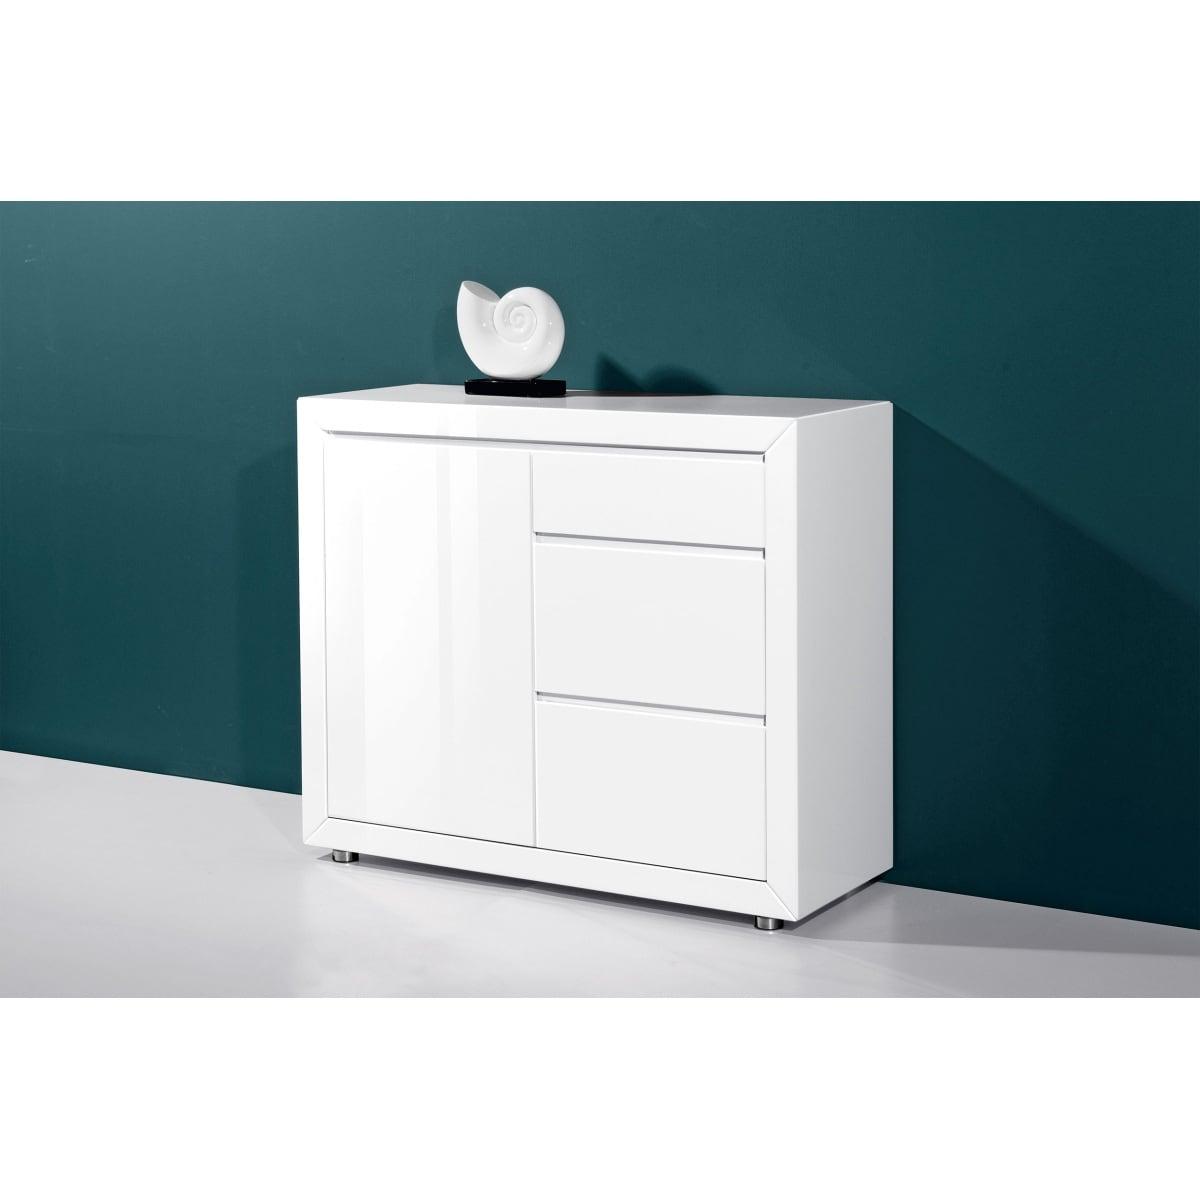 kommode in hochglanz wei porta porta m bel. Black Bedroom Furniture Sets. Home Design Ideas